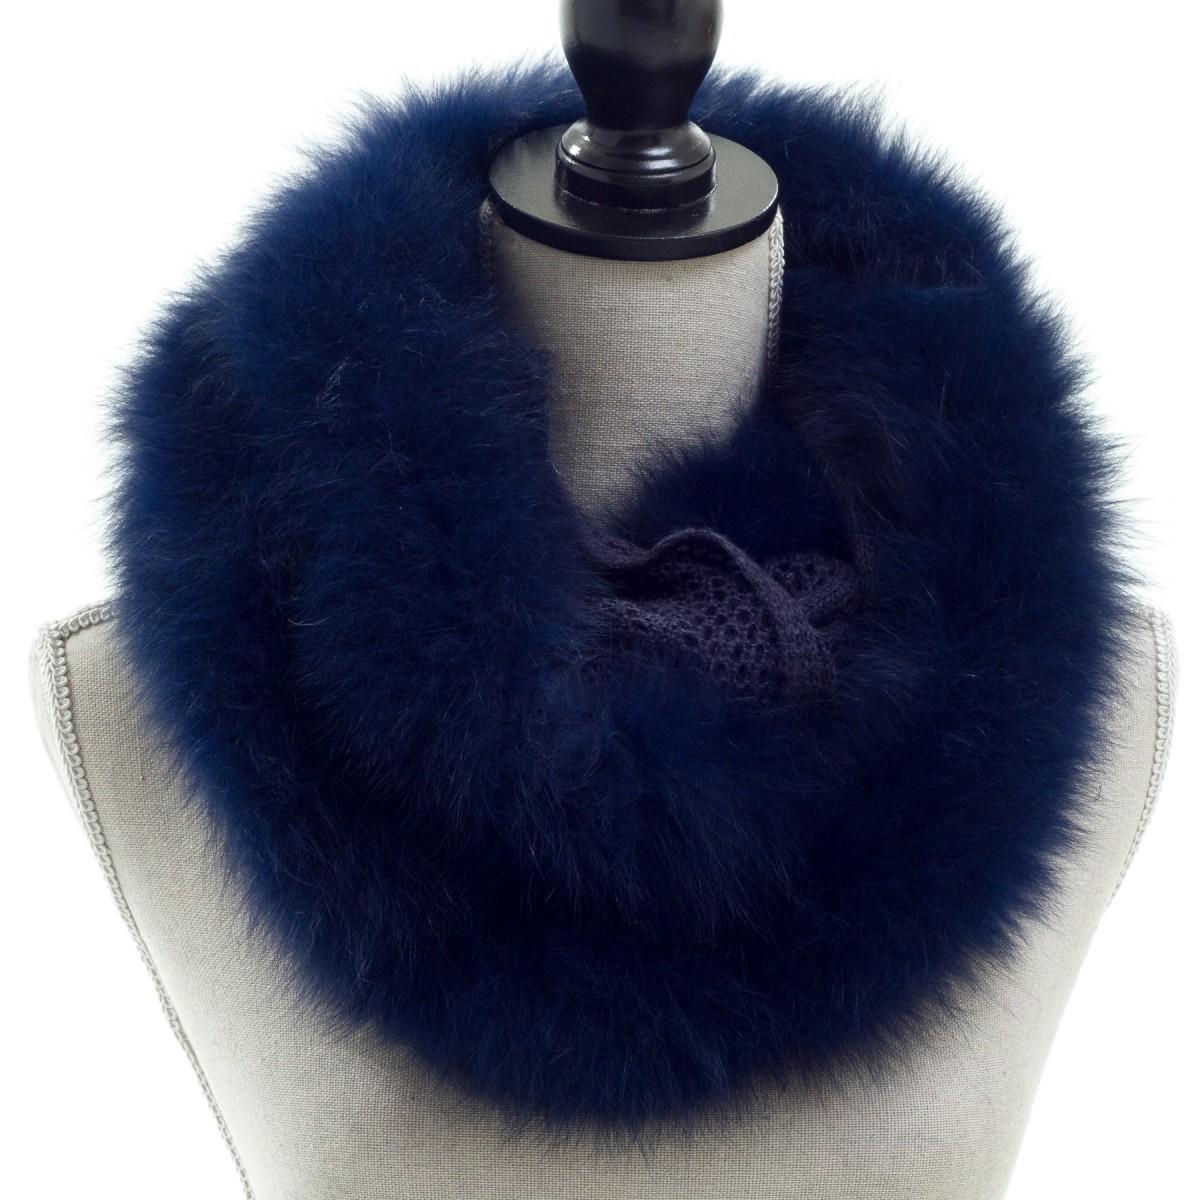 Knit Infinity Loop with Fox Fur Trim $225.00